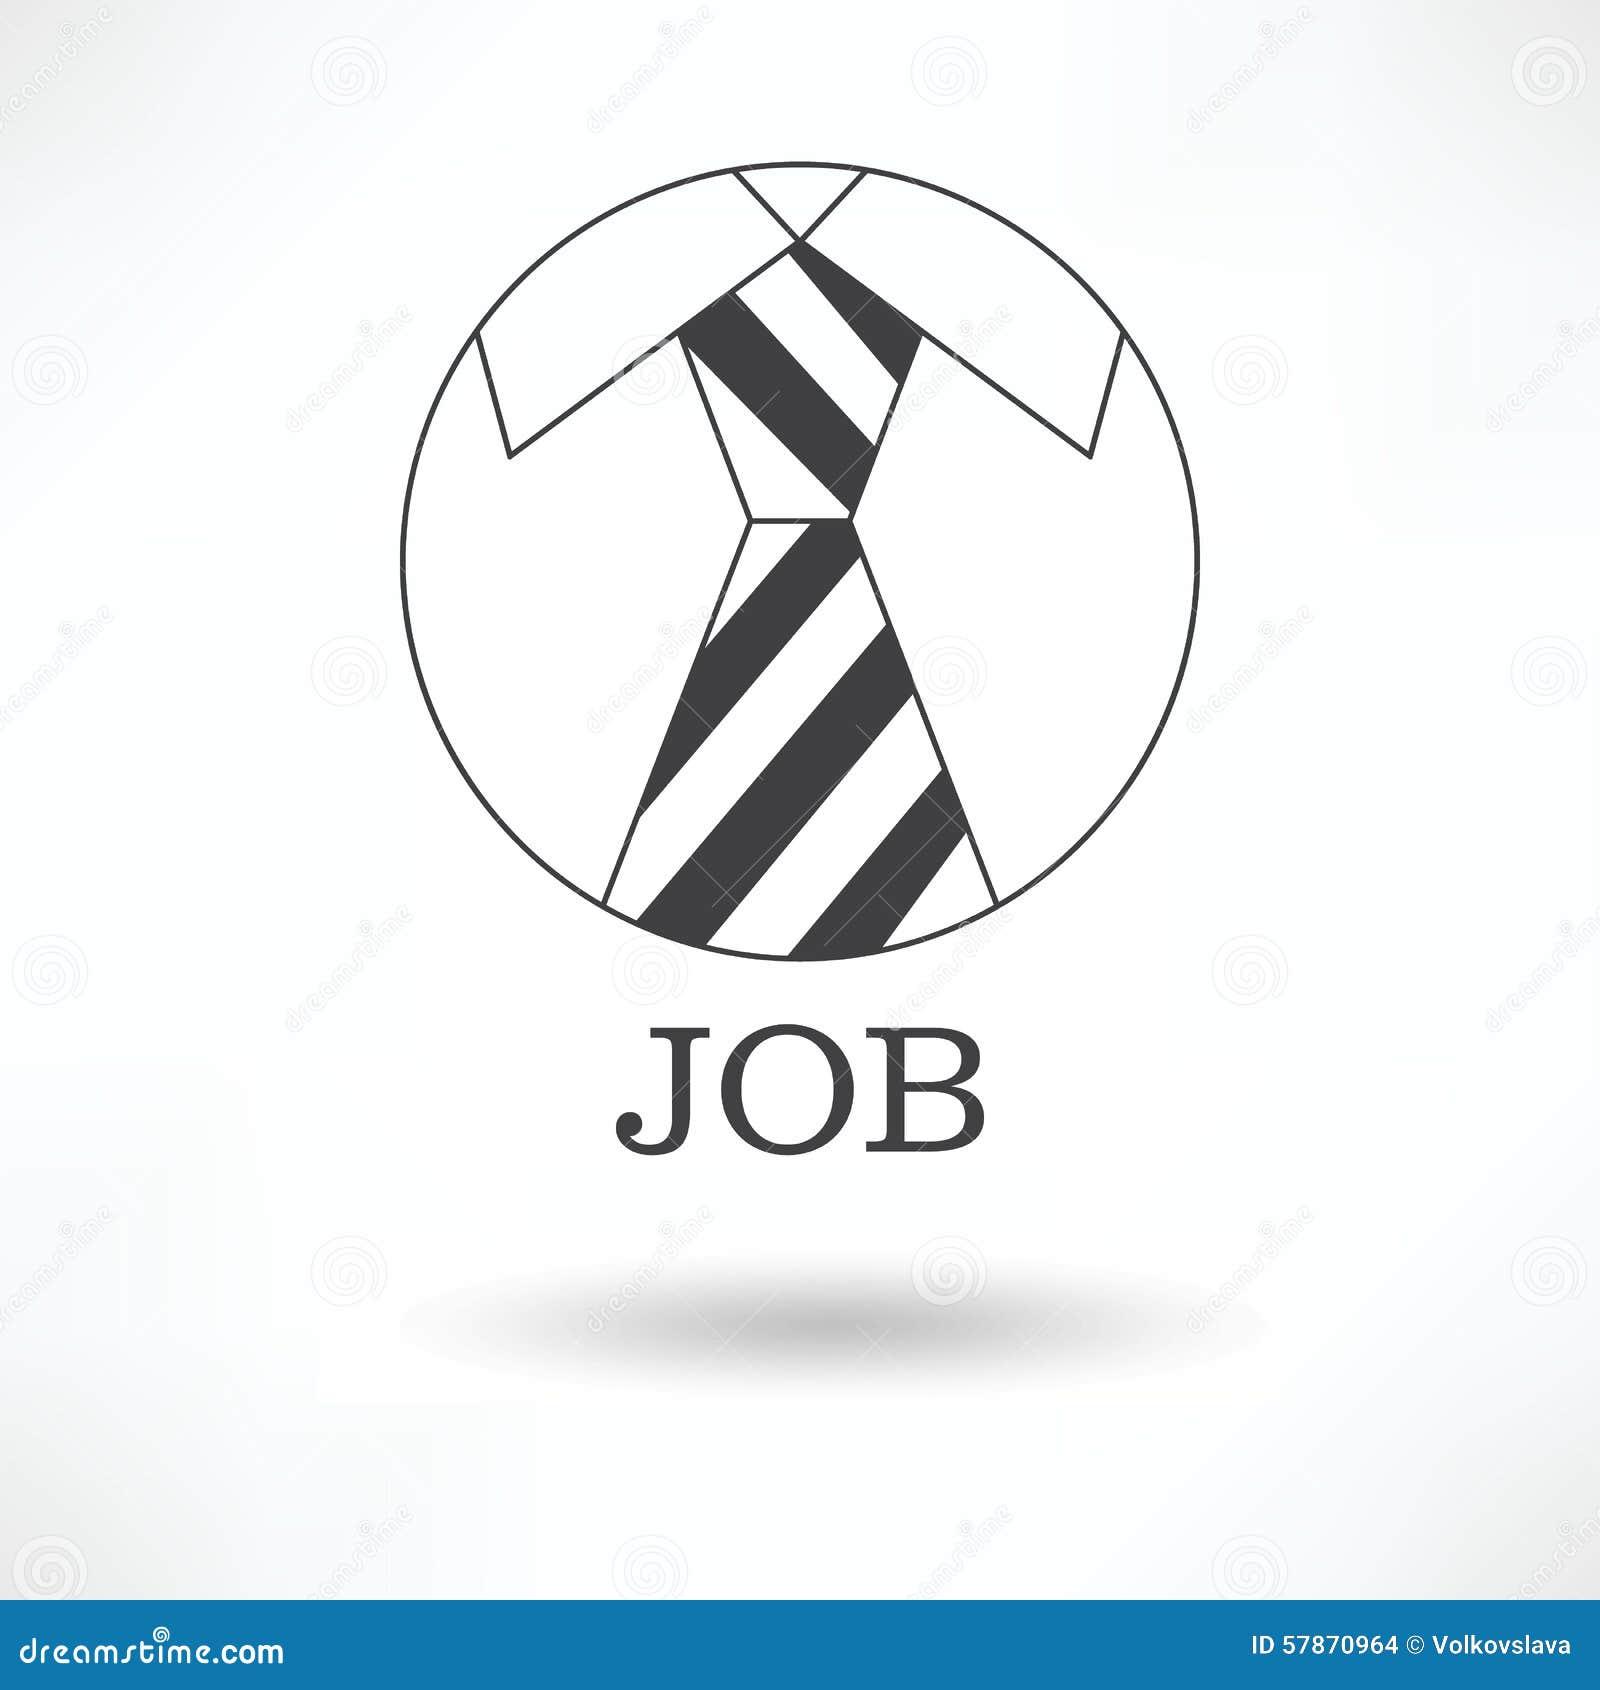 Vector Drawing Lines Job : The logo symbol tie office job stock vector image